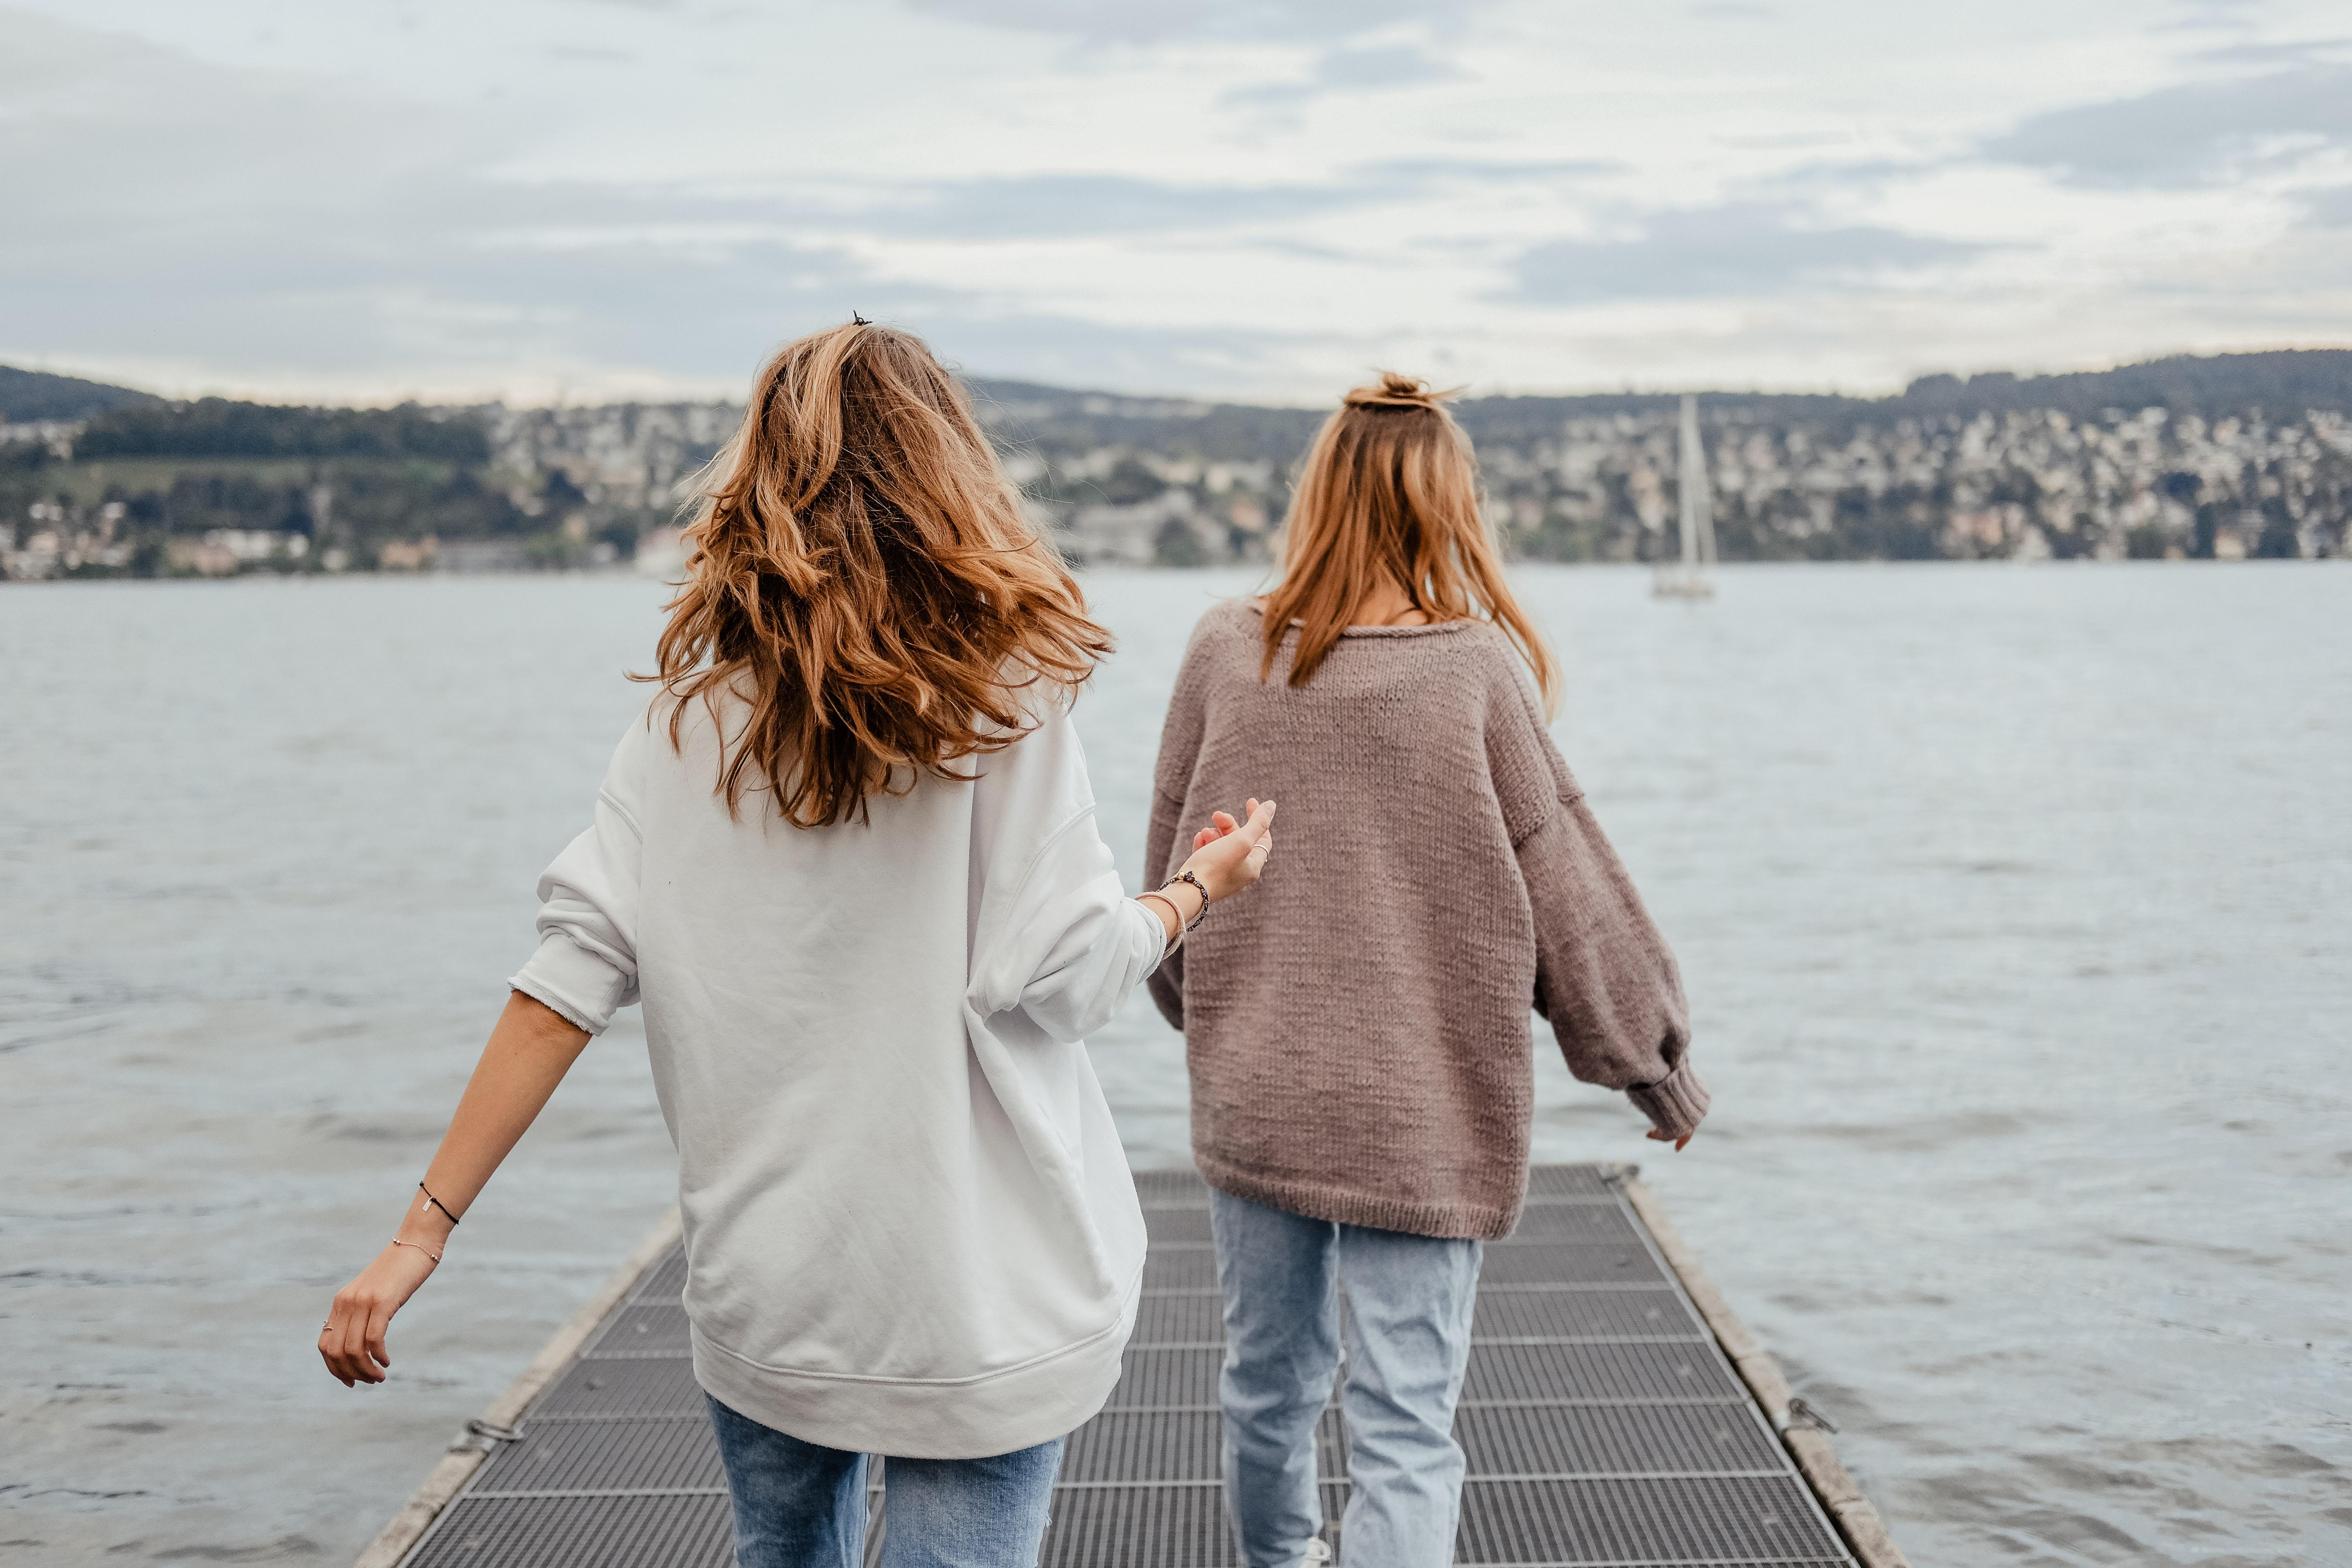 Two women having fun on a bridge.